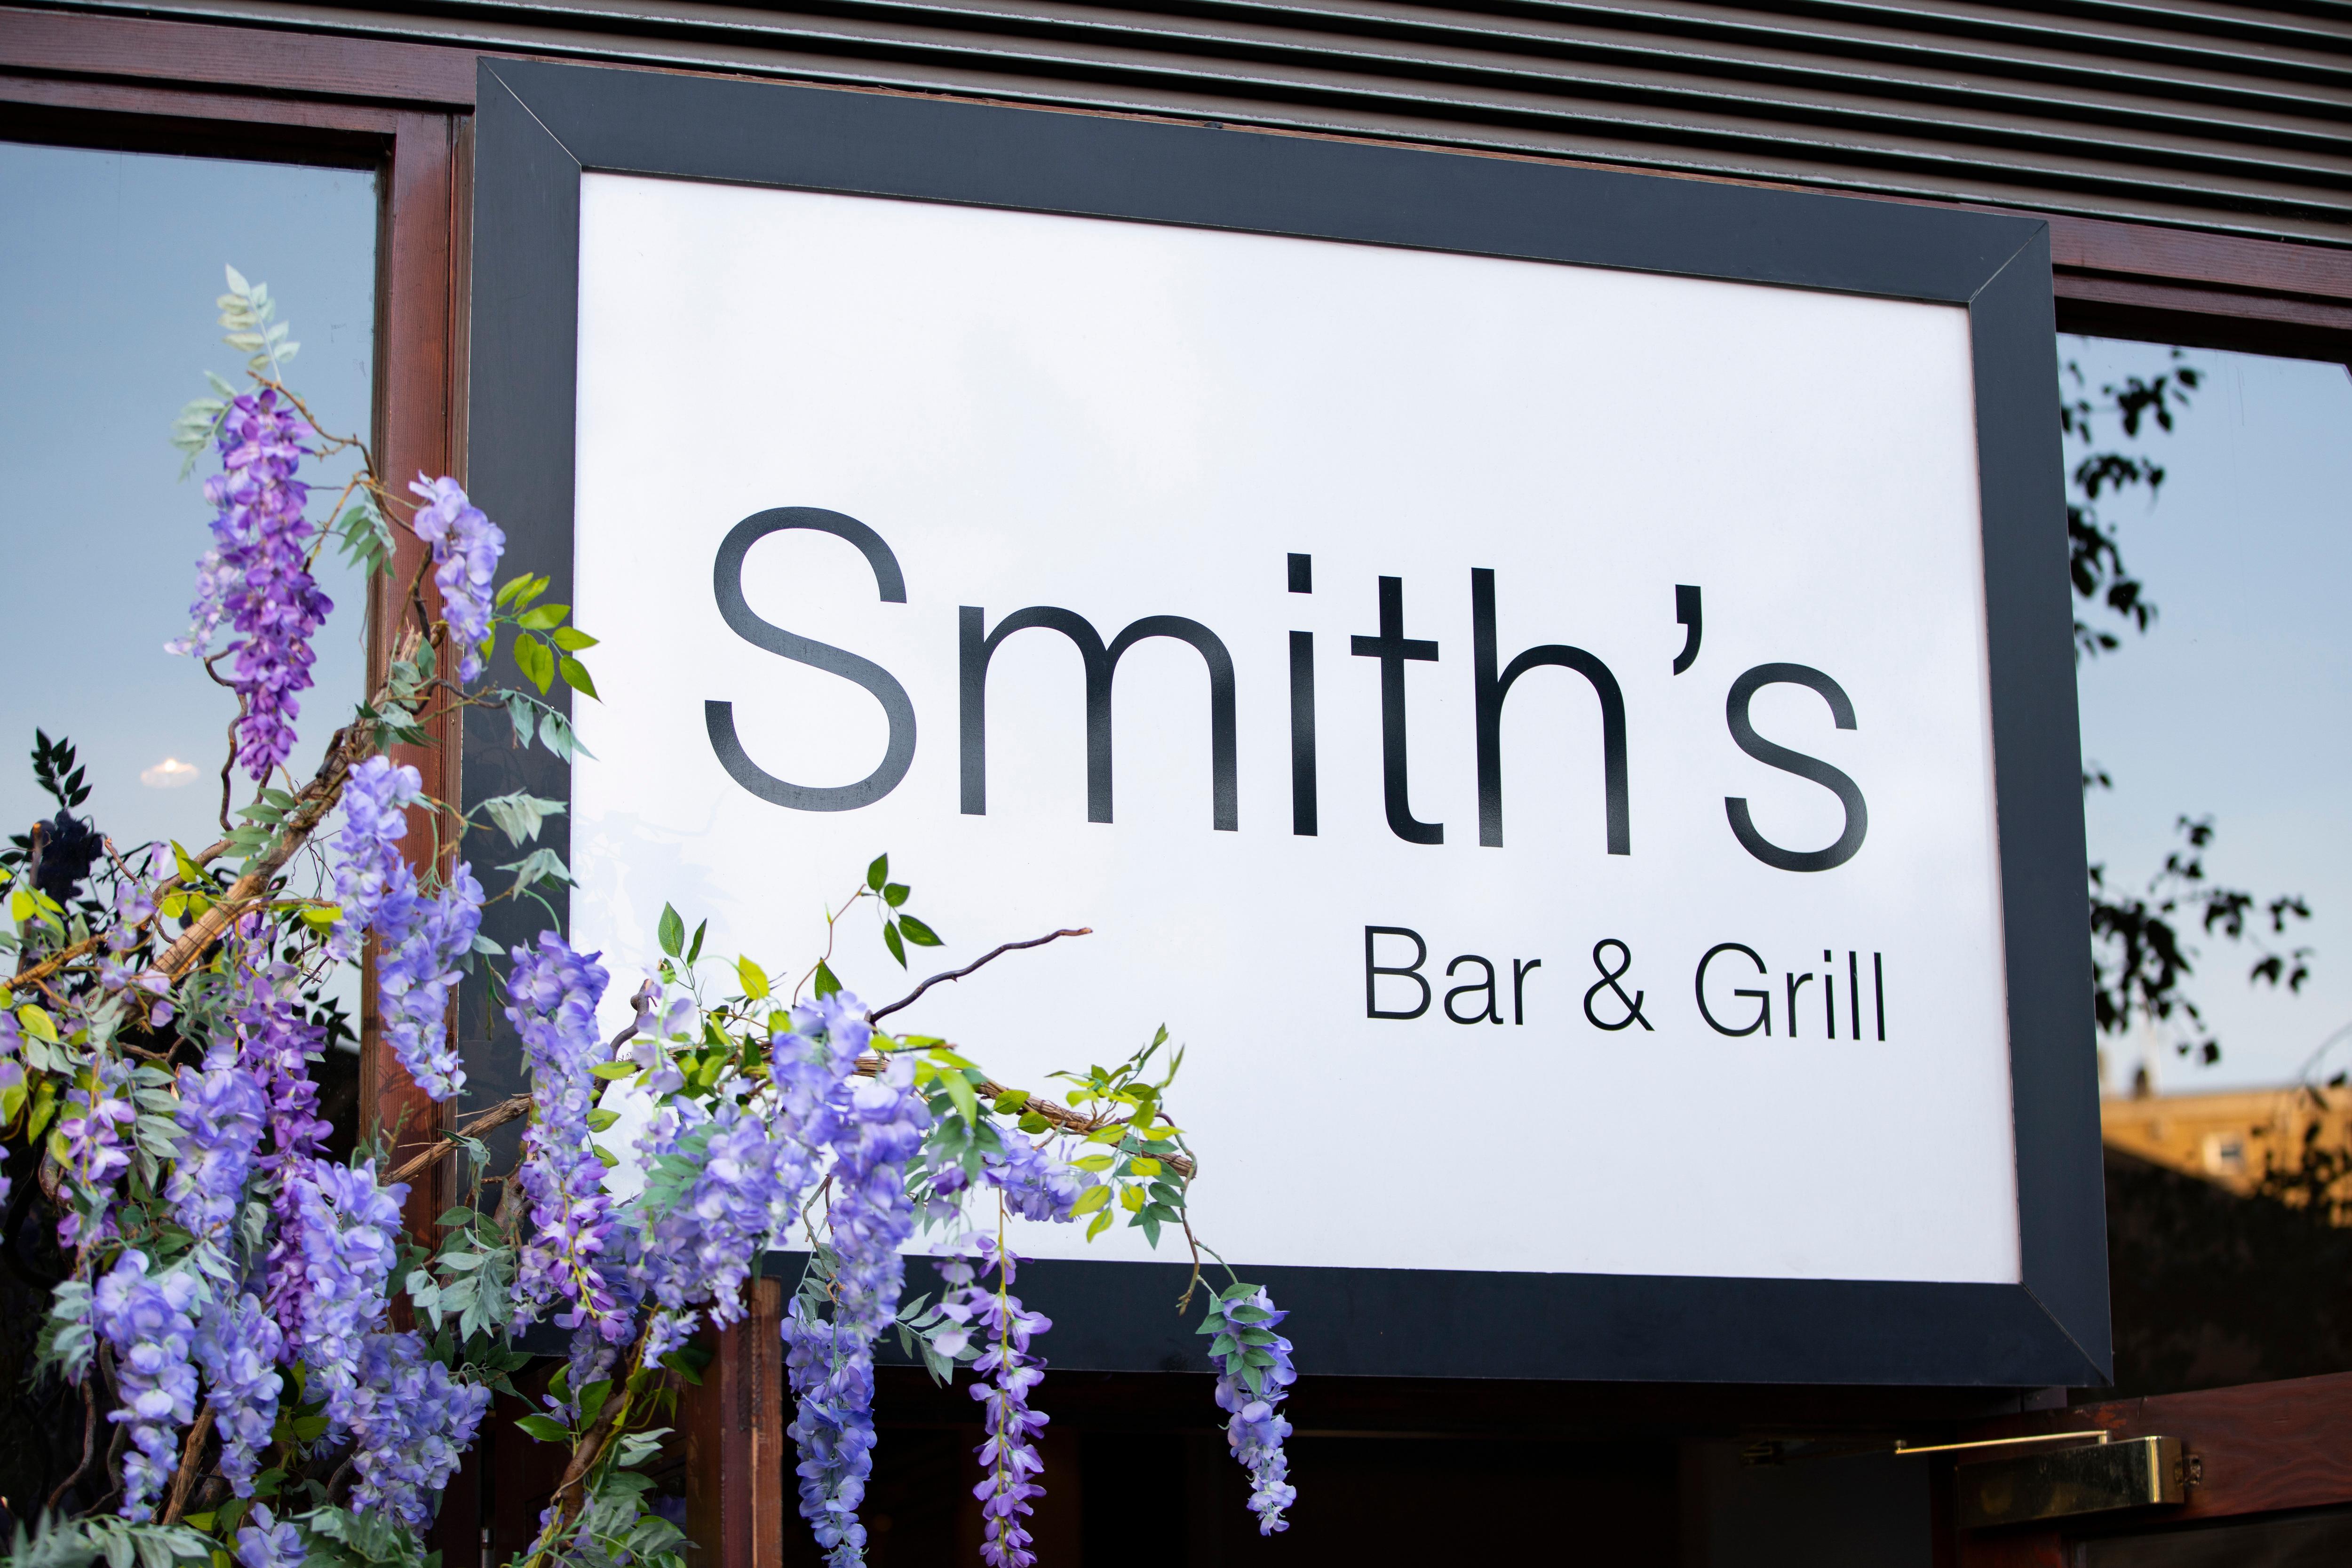 Smiths restaurant front sign